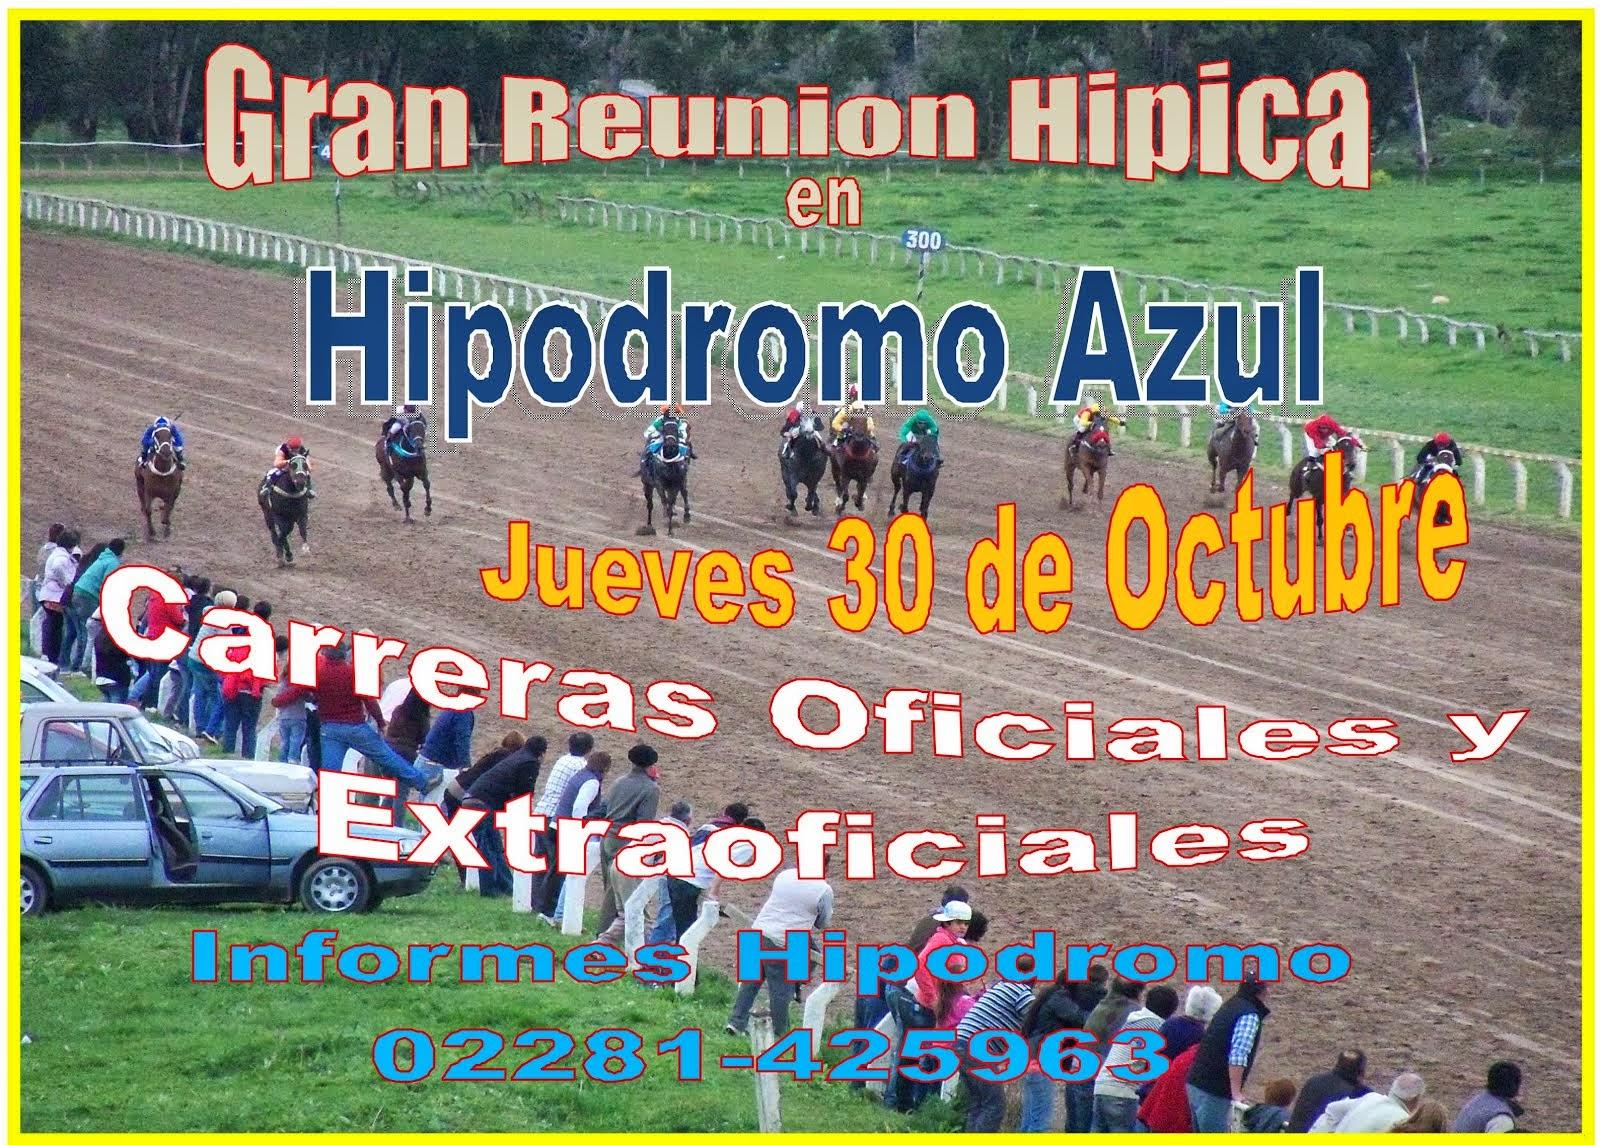 Hipódromo Azul